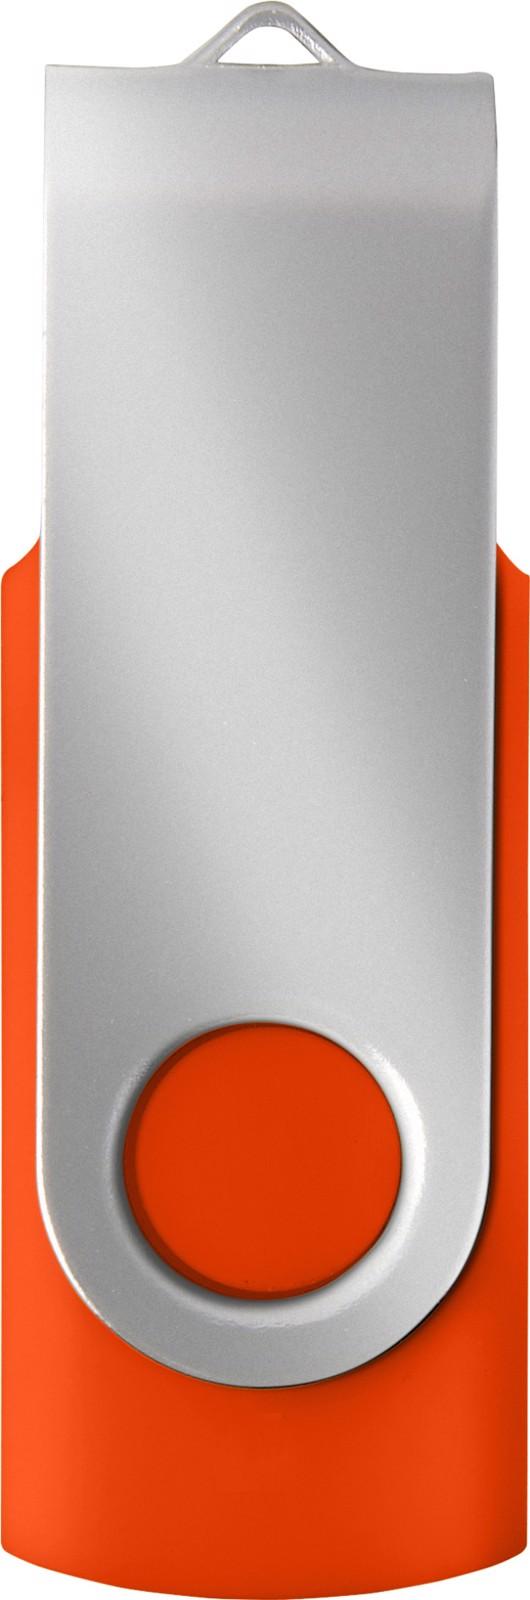 ABS USB drive (16GB/32GB) - Orange / Silver